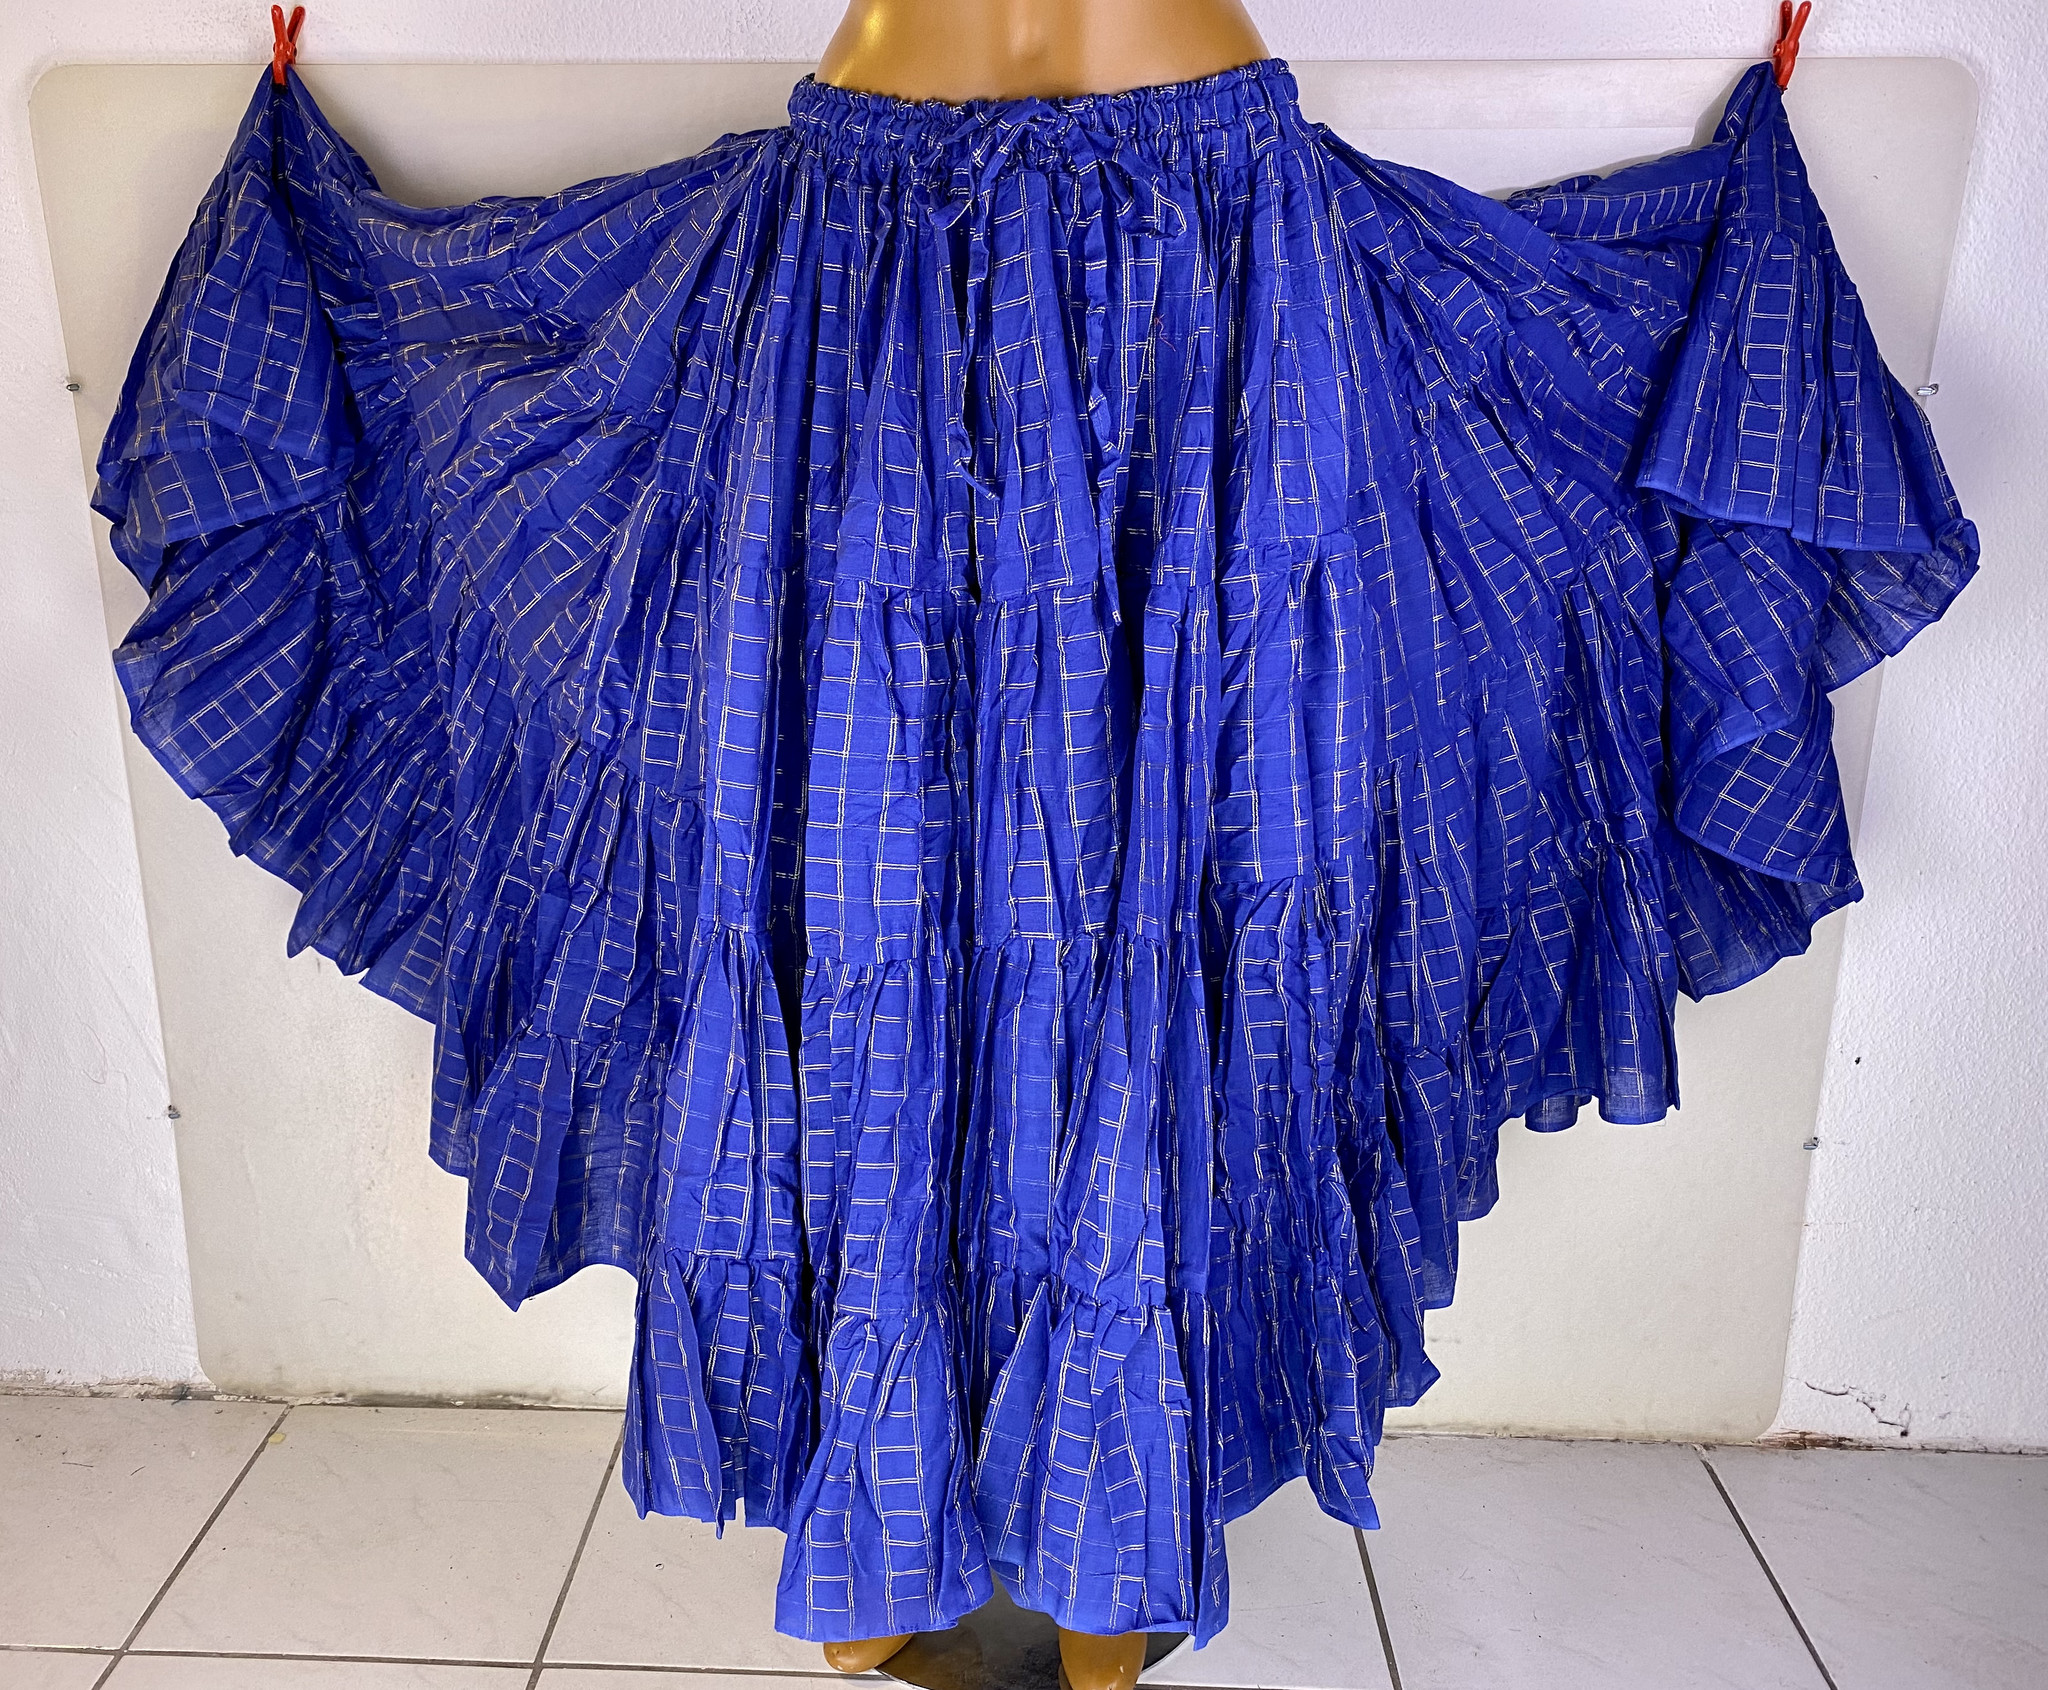 Skirt/ Tribalrock  24 yards blau